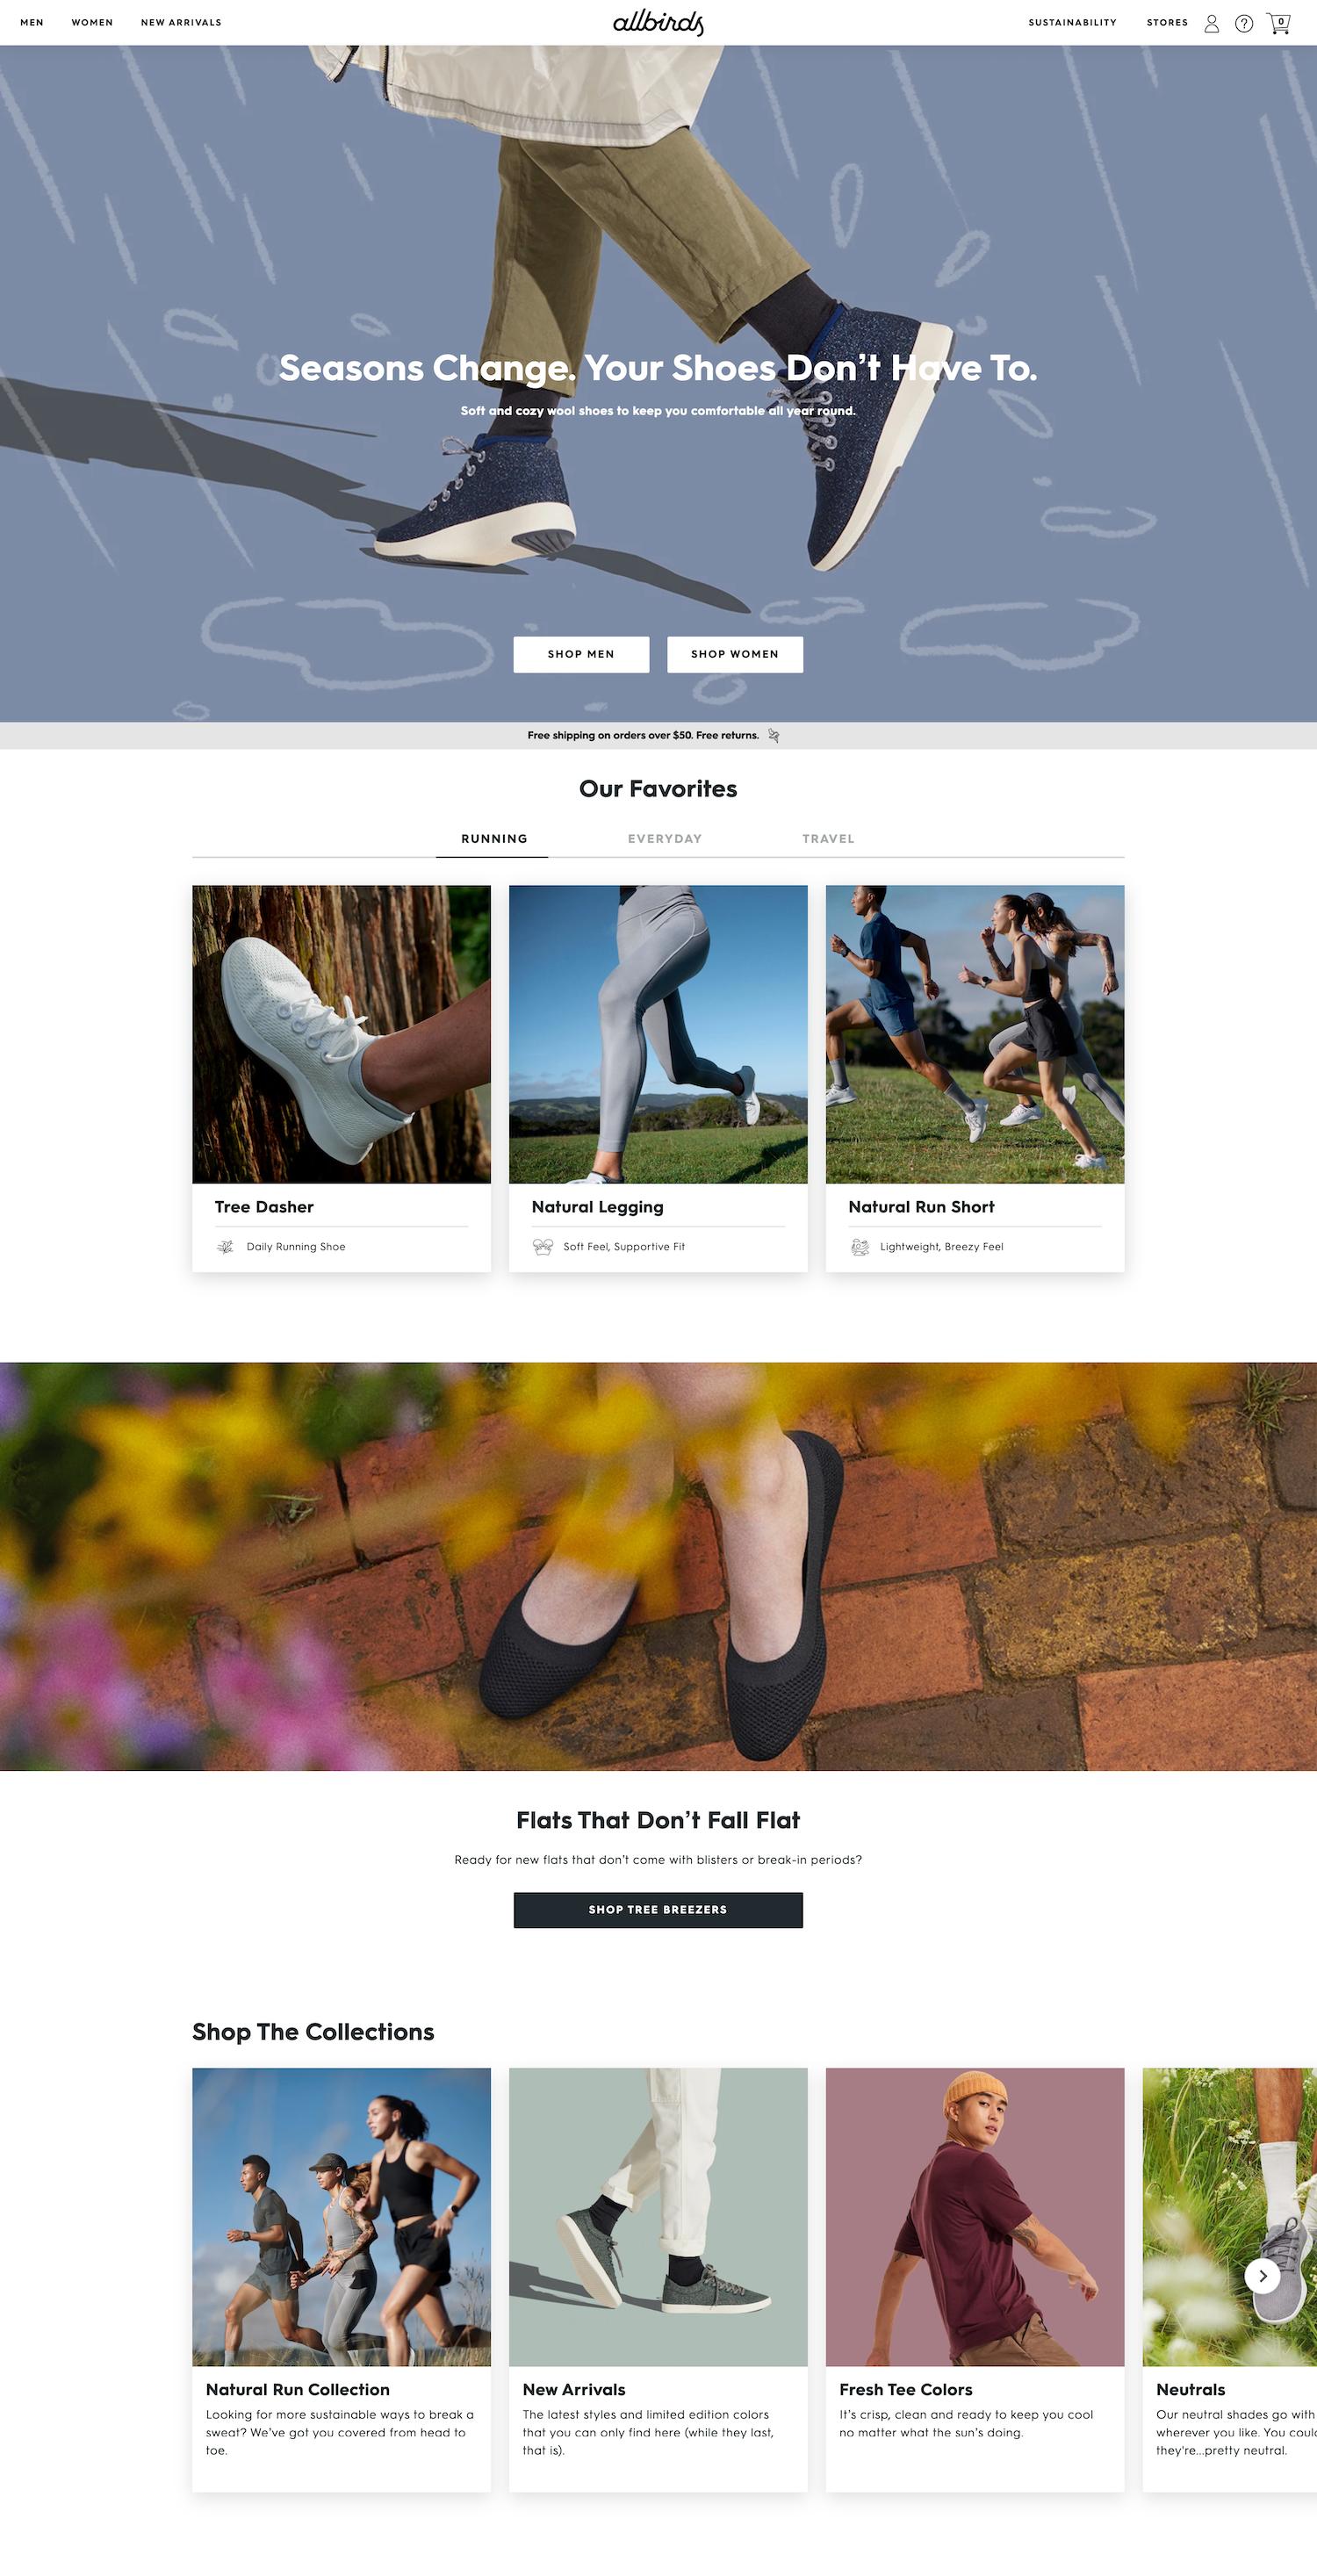 allbirds homepage top half shoes leggings shorts